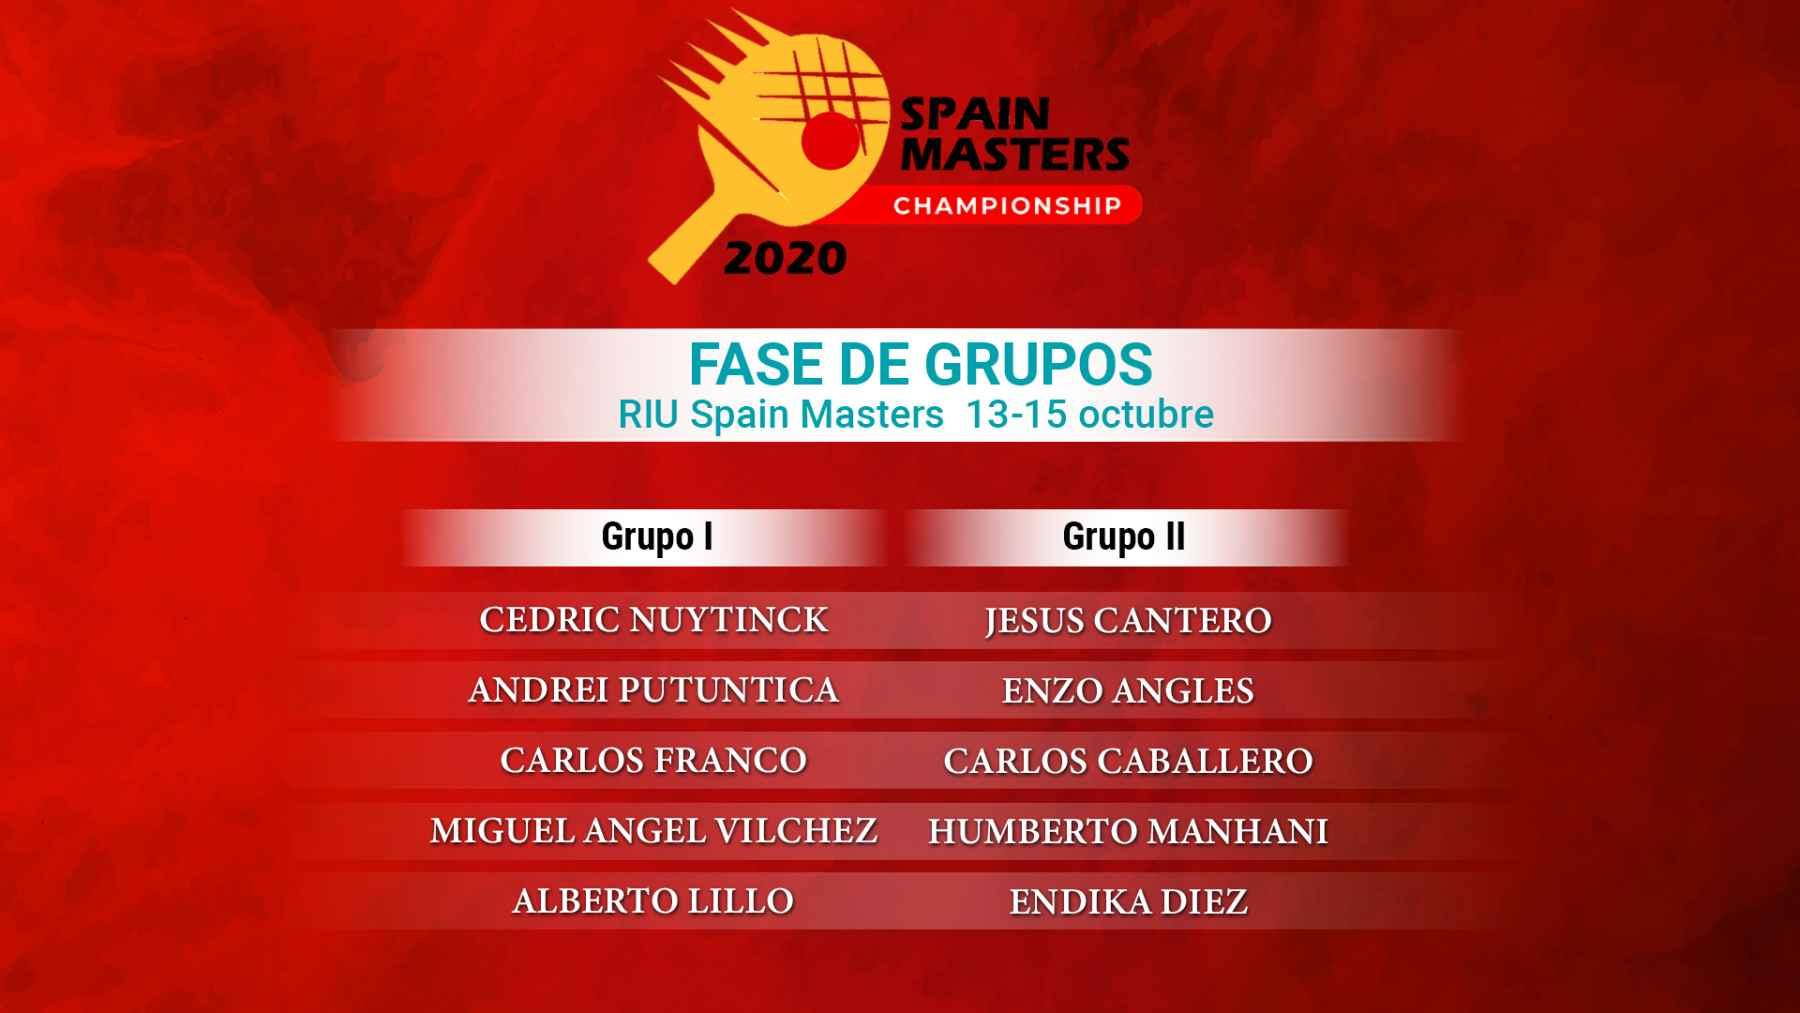 Composición Grupos RIU Spain Masters 2020